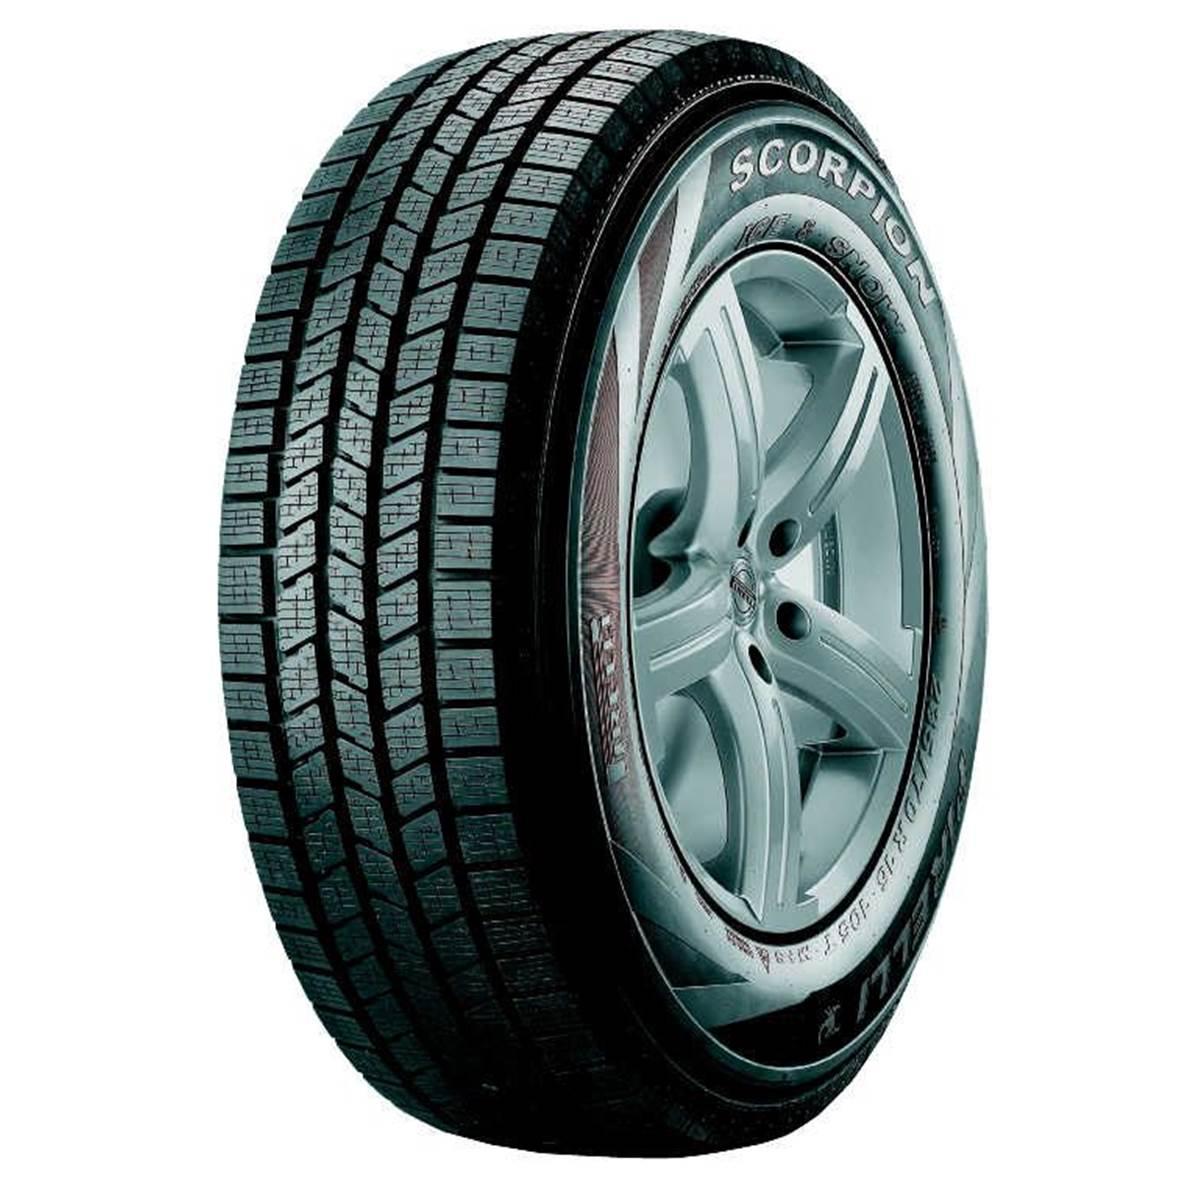 Pneu Pirelli 235/65R17 104H SCORPION WINTER